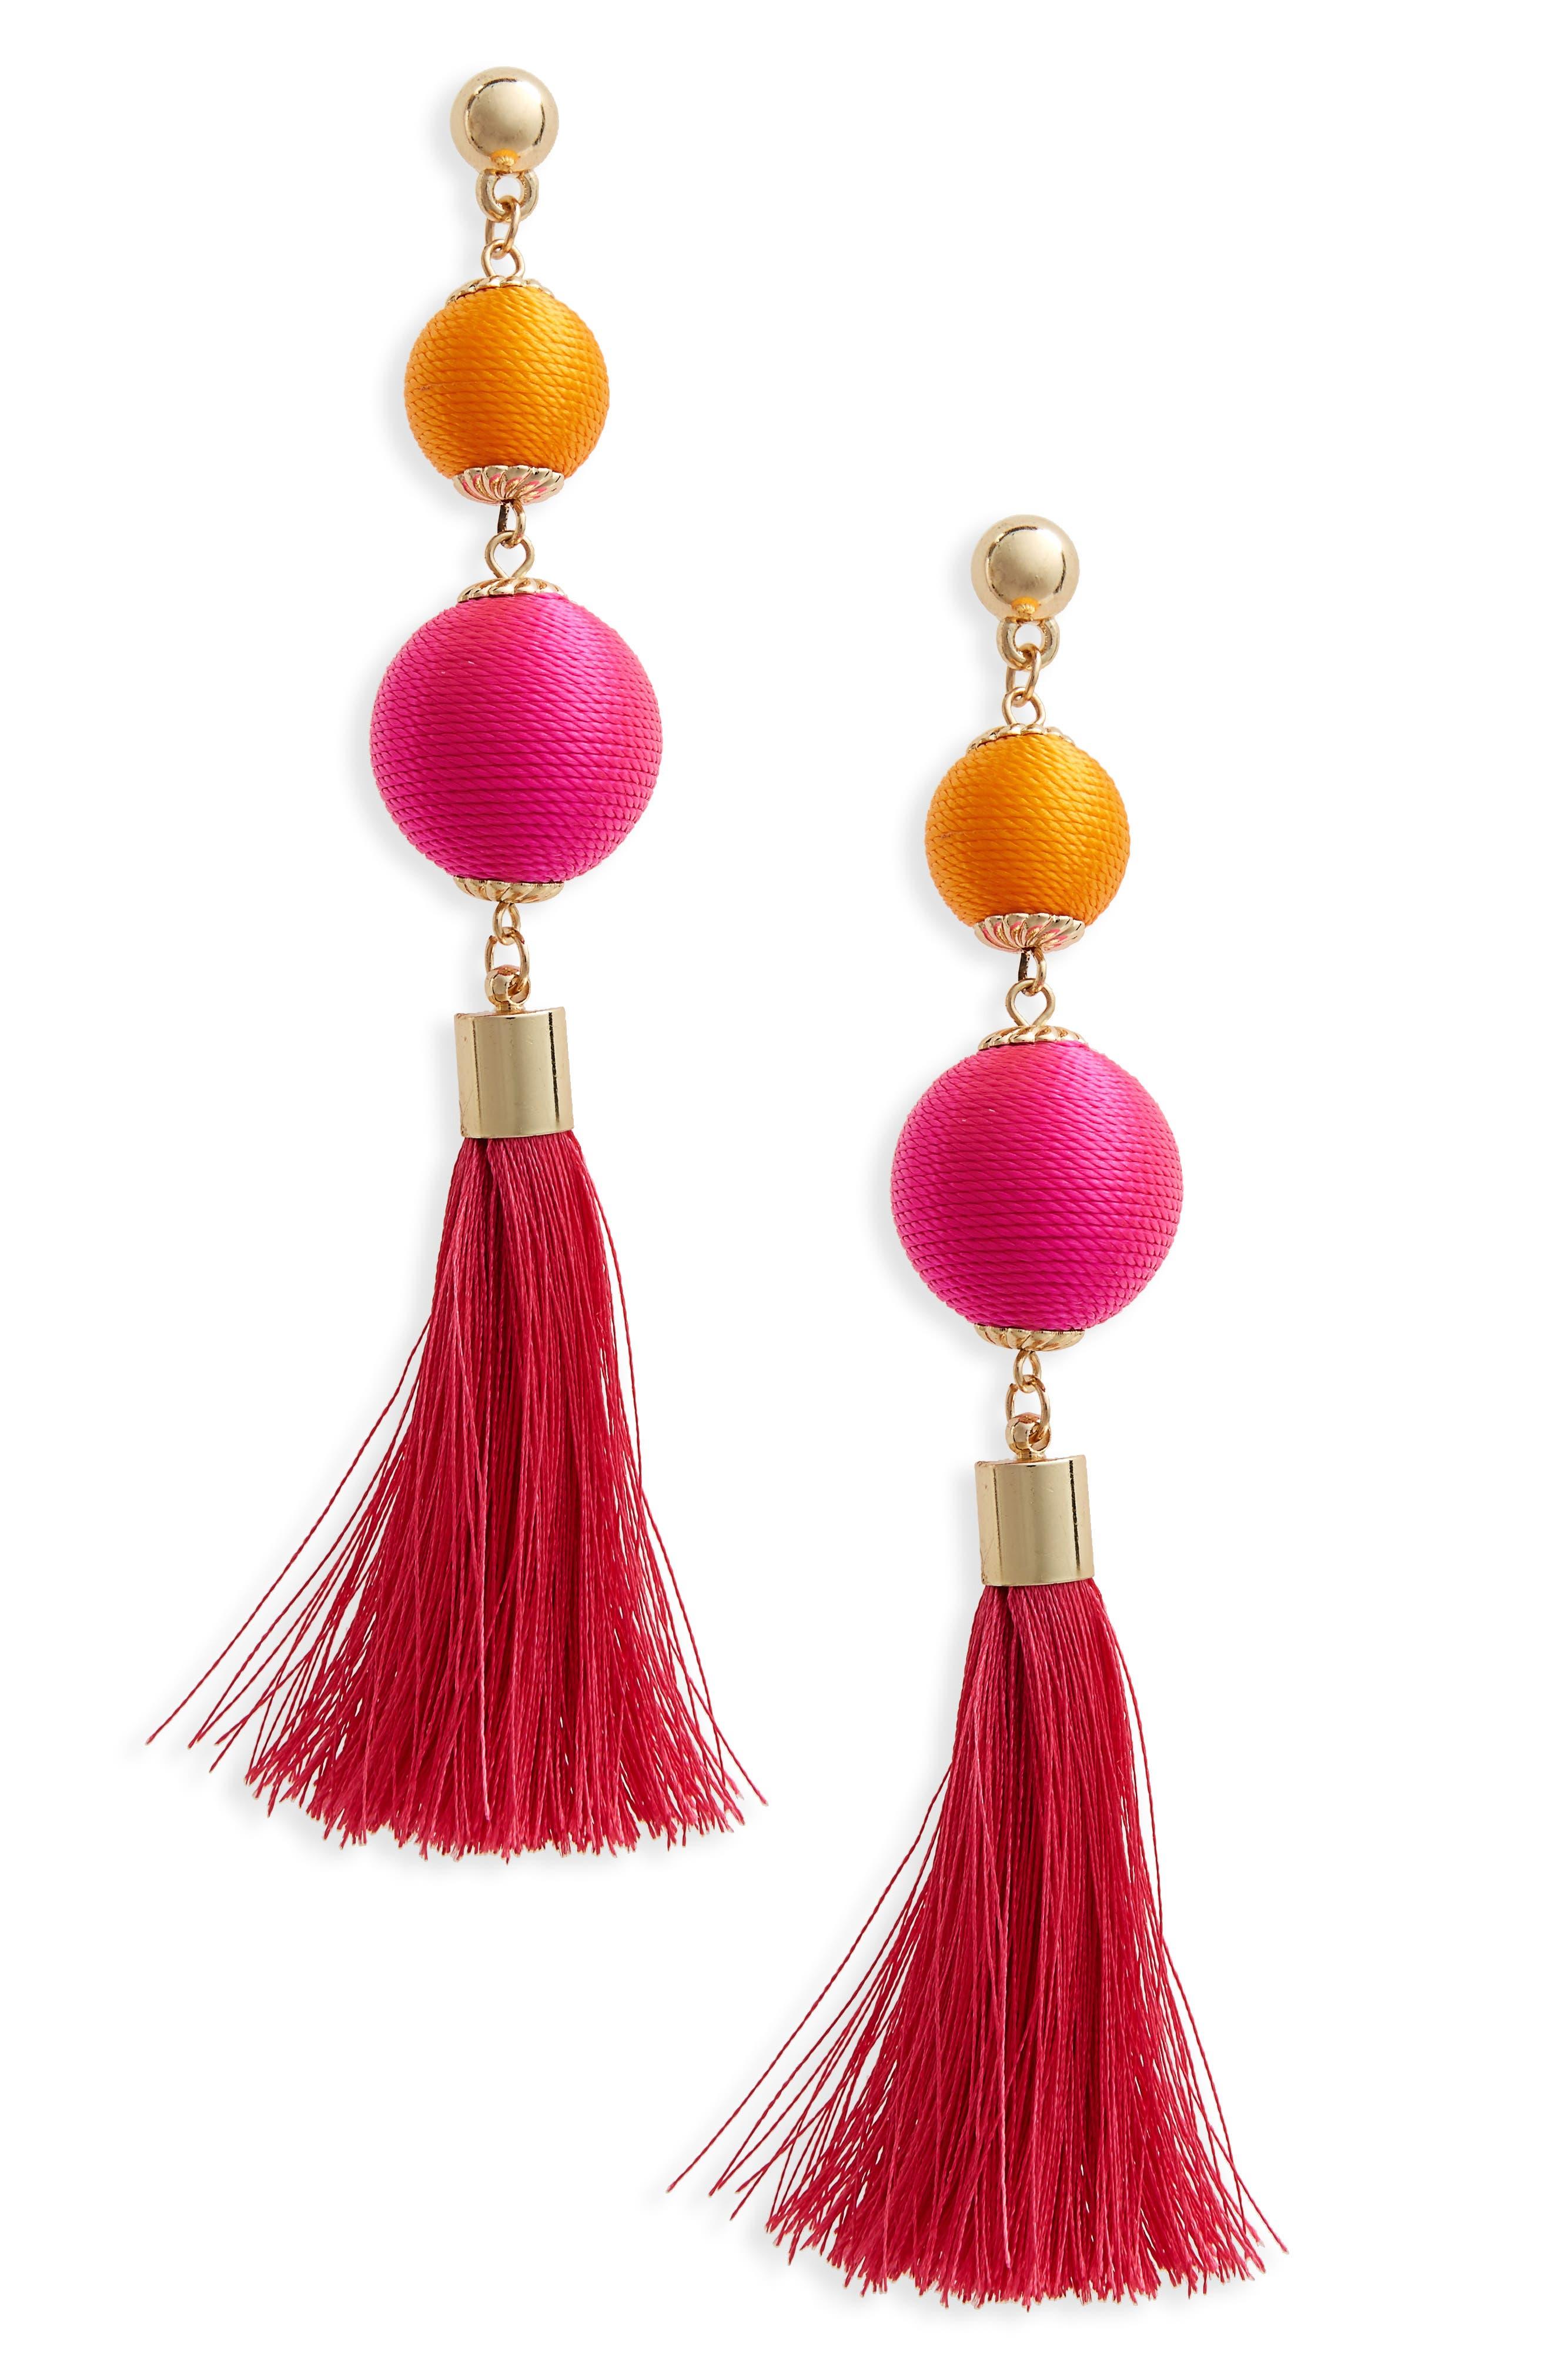 Ball Drop Earrings,                             Main thumbnail 1, color,                             Pink